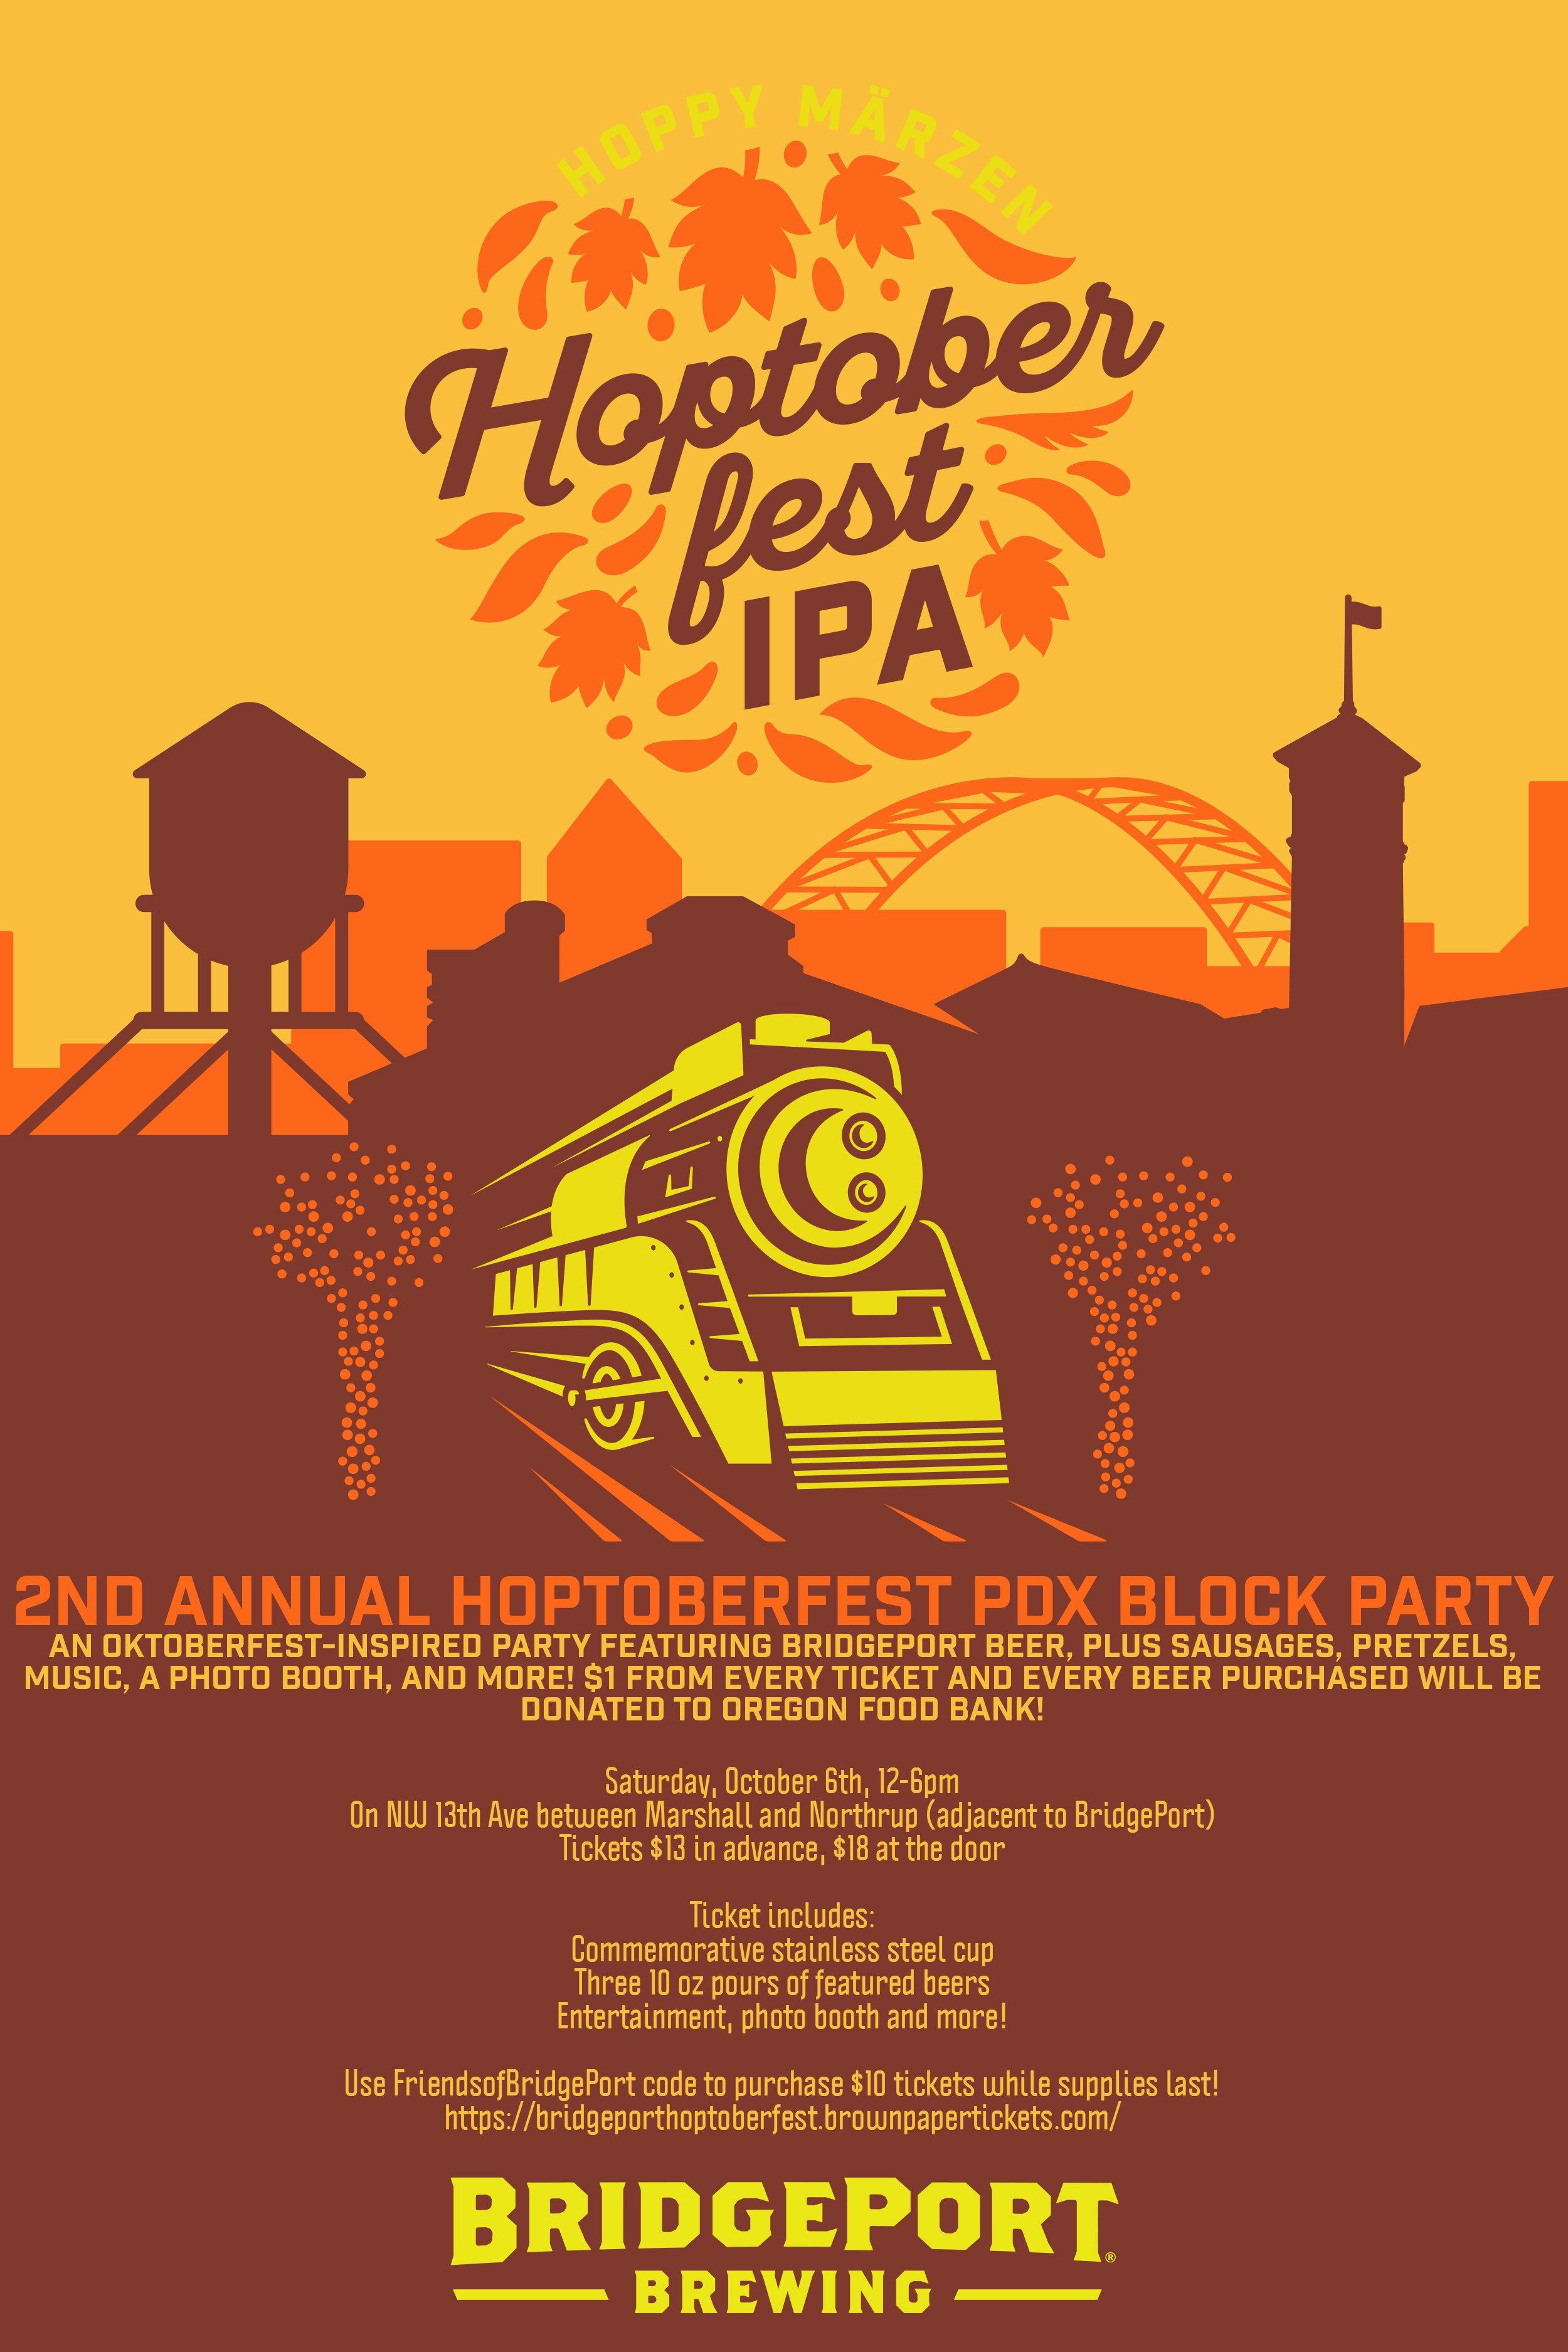 2018 hoptoberfest block party @ bridgeport brewing | oktoberfest